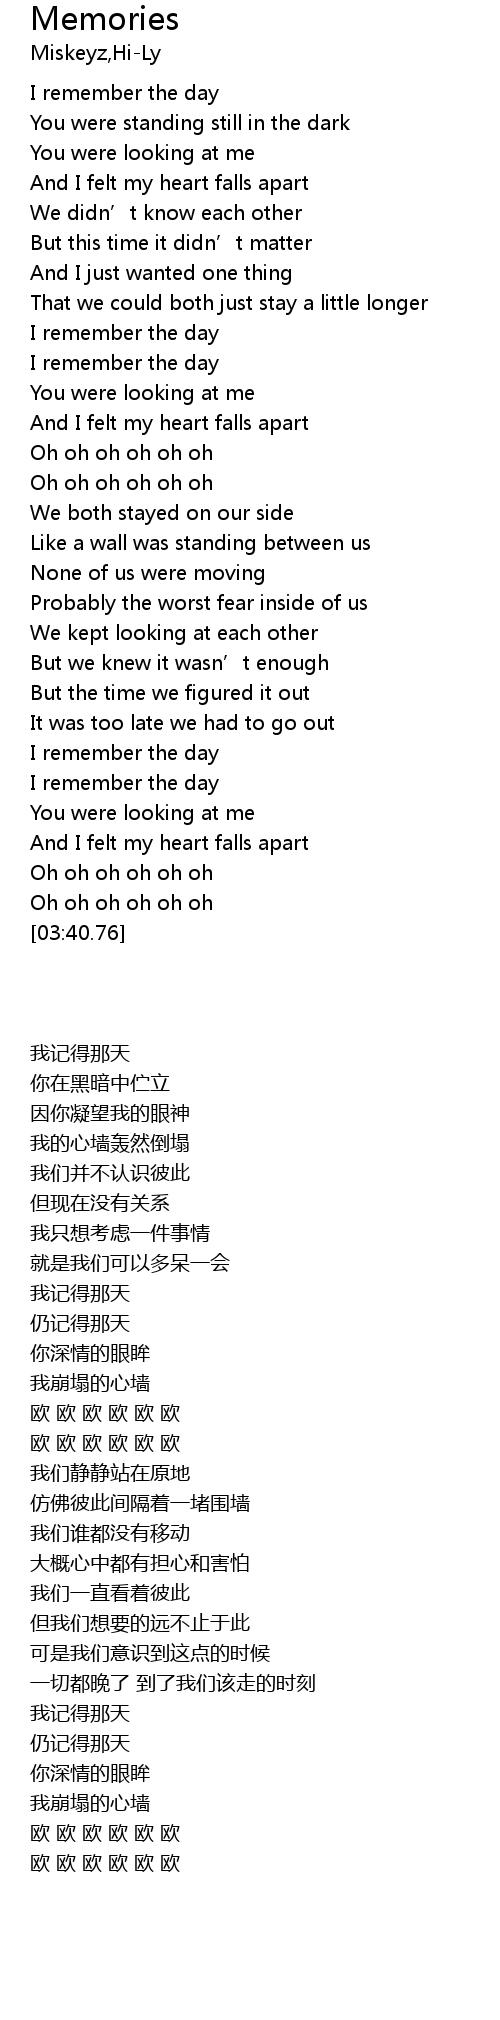 Memories Lyrics Images